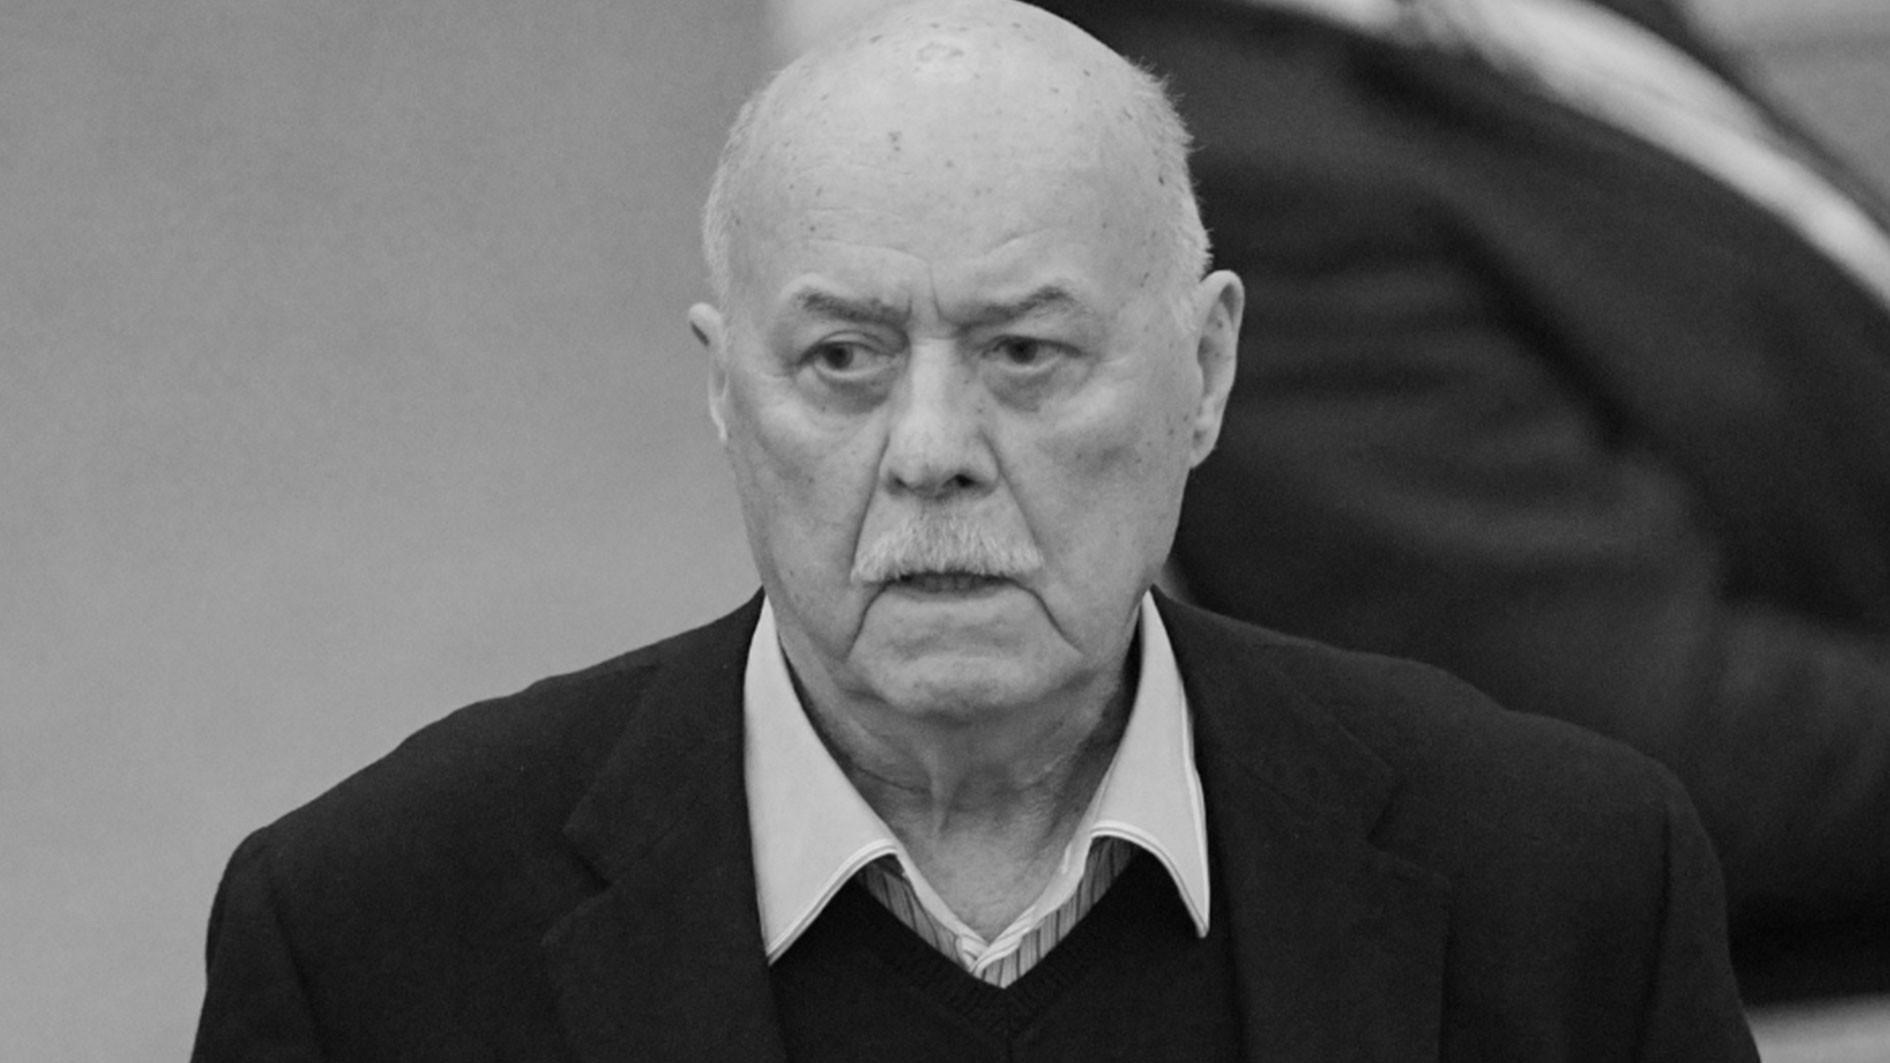 <p><span>Станислав Говорухин. Фото:&copy;РИА Новости/Владимир Федоренко</span></p> <div> <div> <div></div> </div> </div> <div> <div> <div></div> </div> </div>